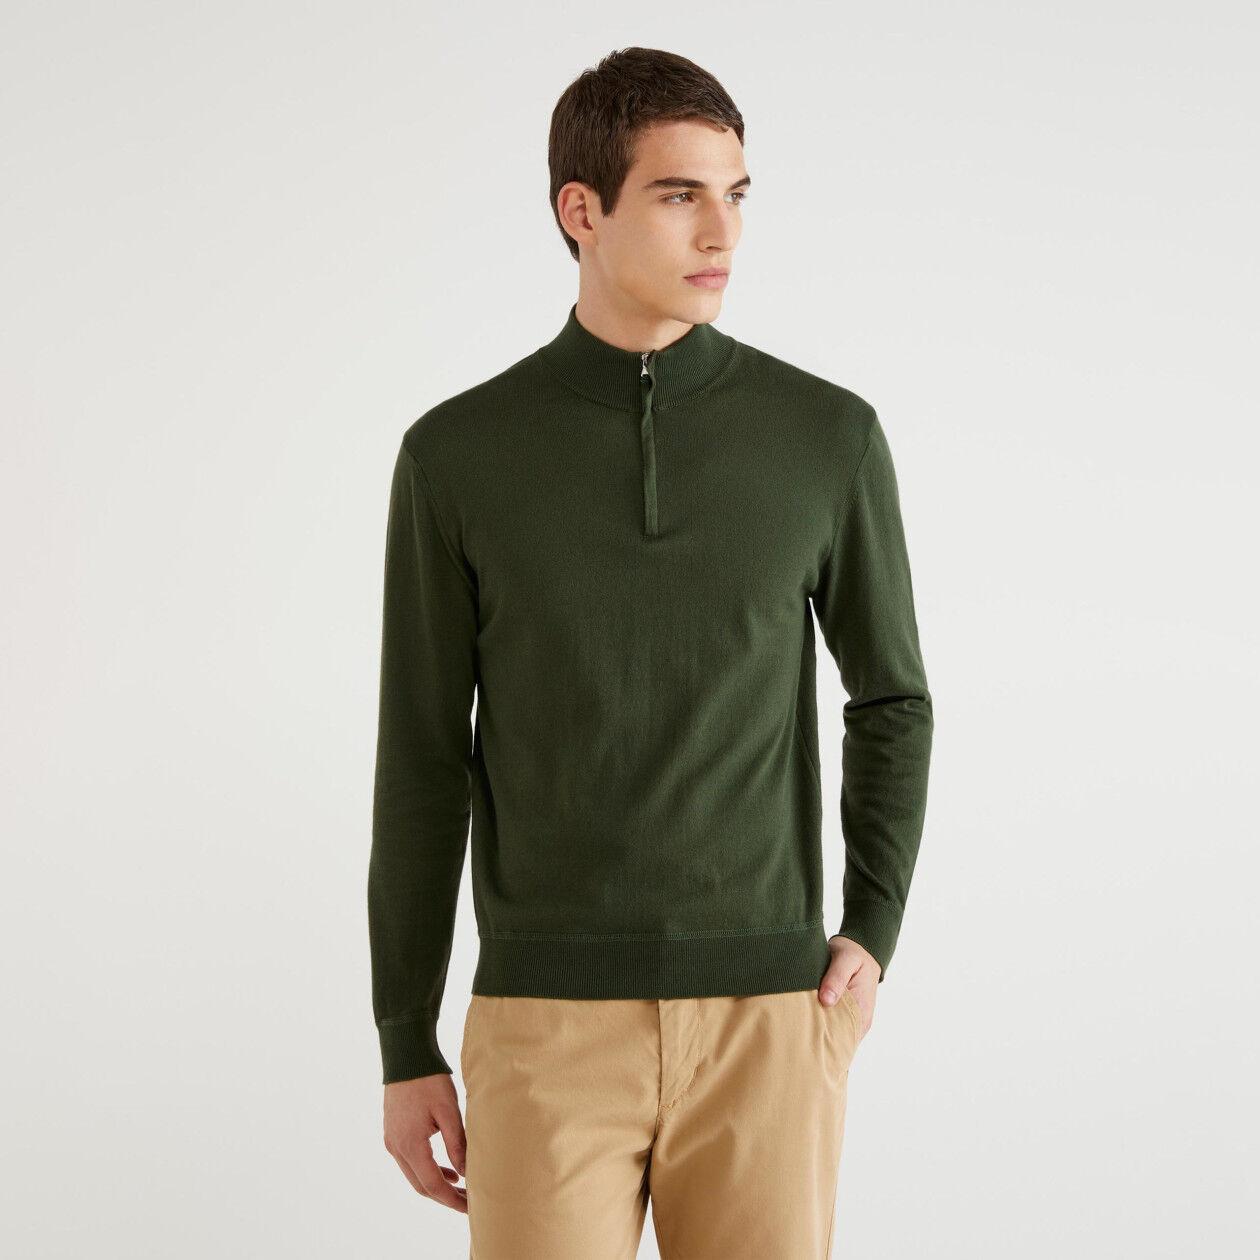 Turtleneck sweater with zipper